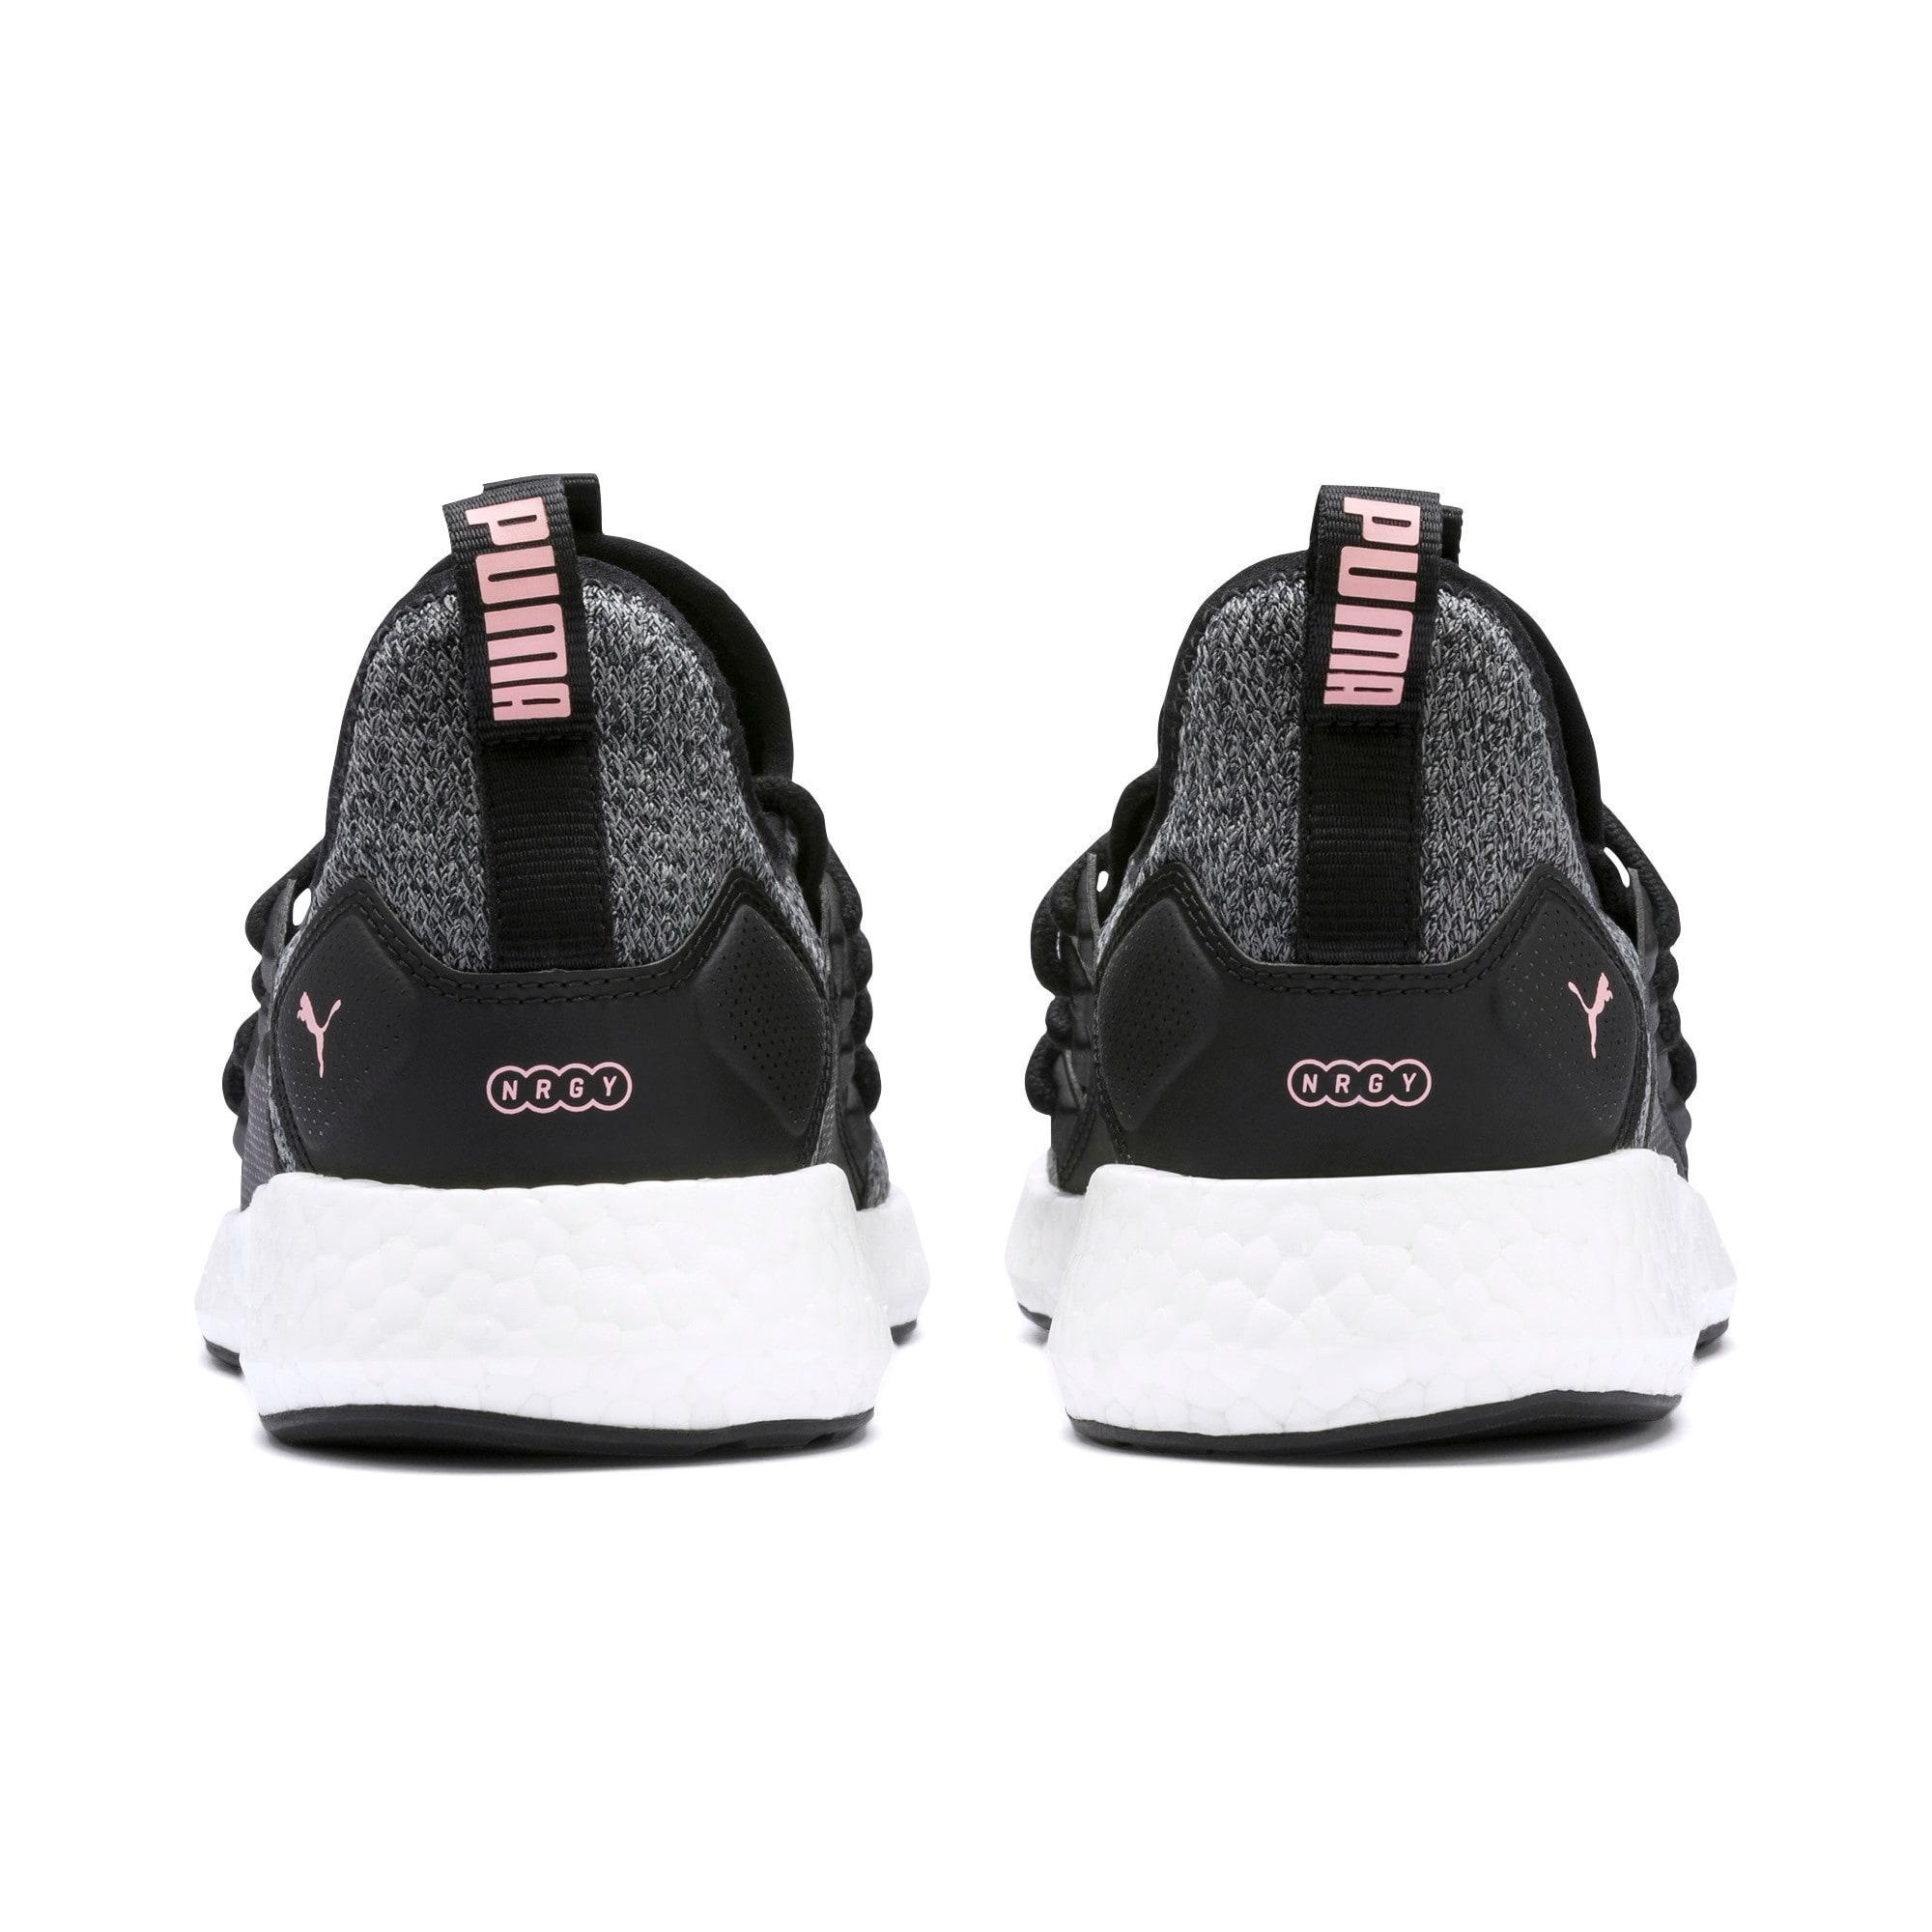 Thumbnail 4 of NRGY Neko Knit Women's Running Shoes, Puma Black-Bridal Rose, medium